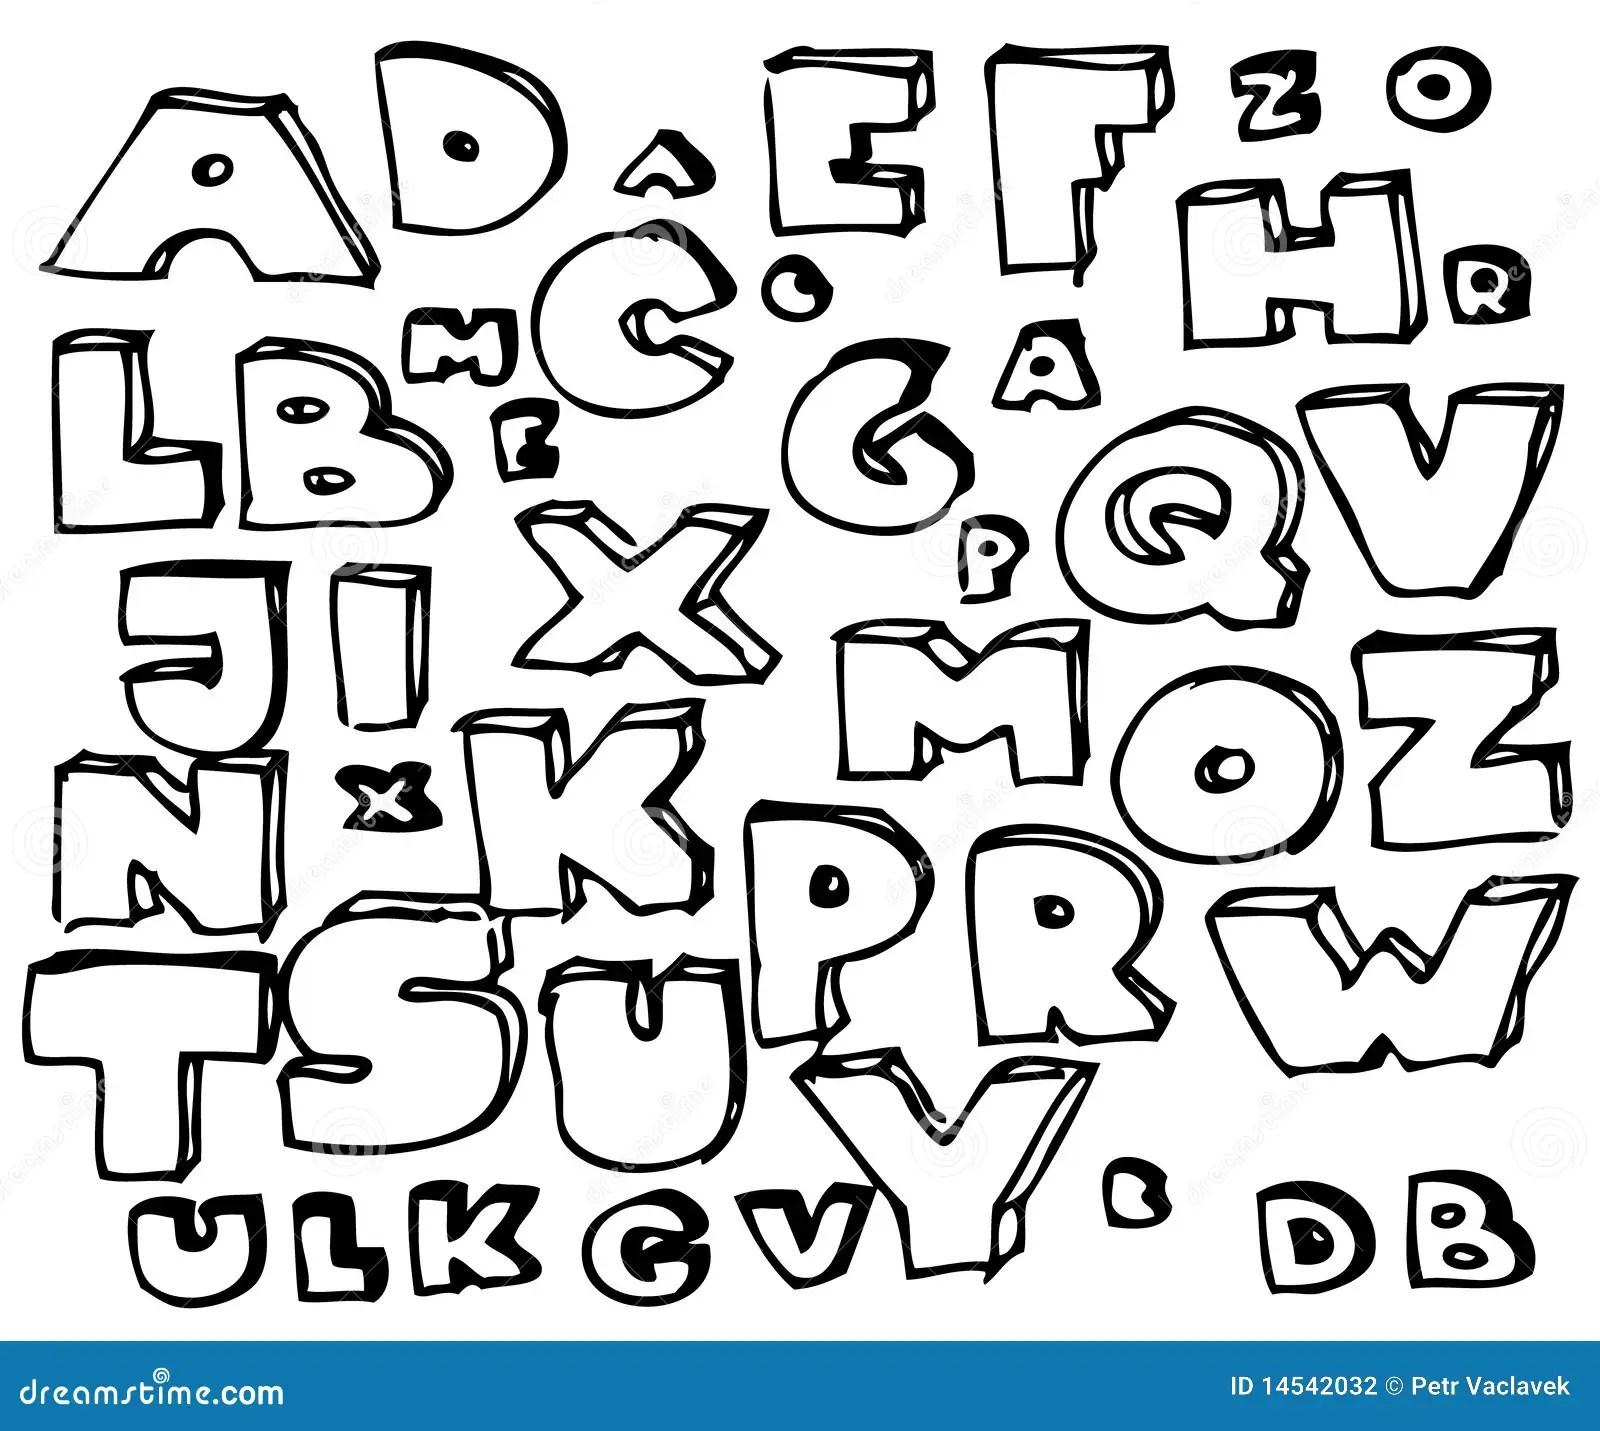 Hand Drawn Doodle Alphabet Stock Photography Image 14542032